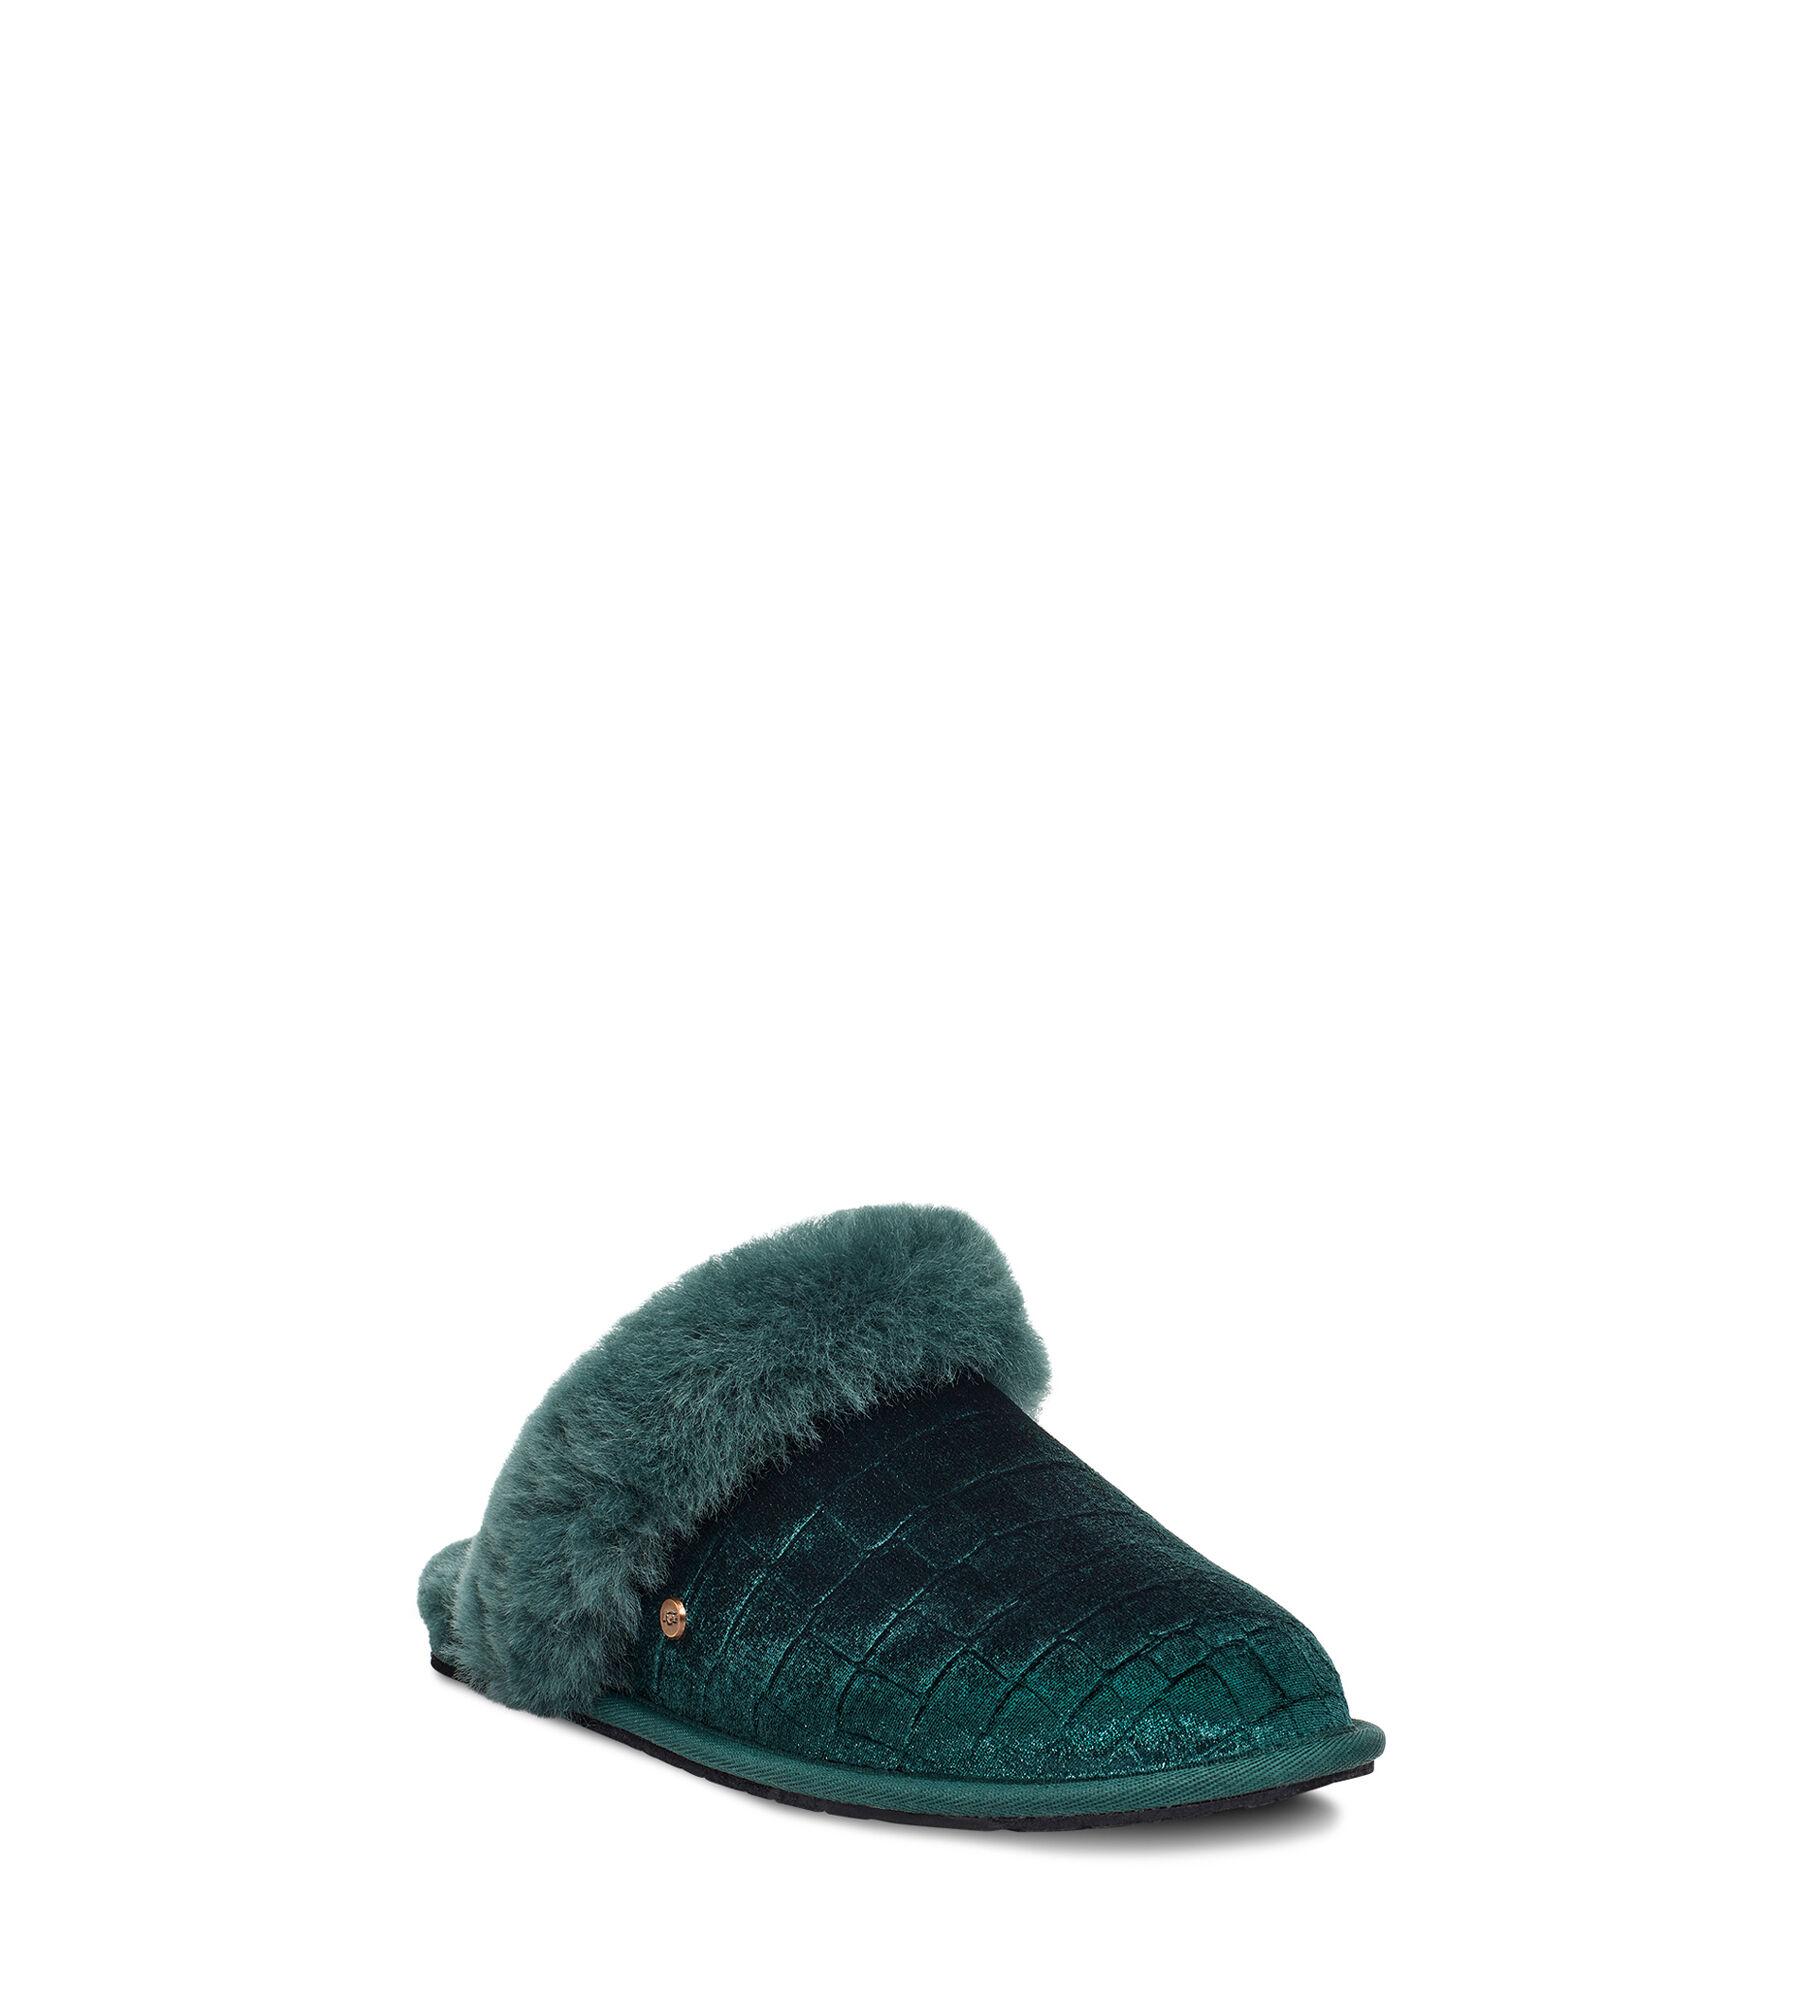 Women's Green Footwear | UGG® Official Site